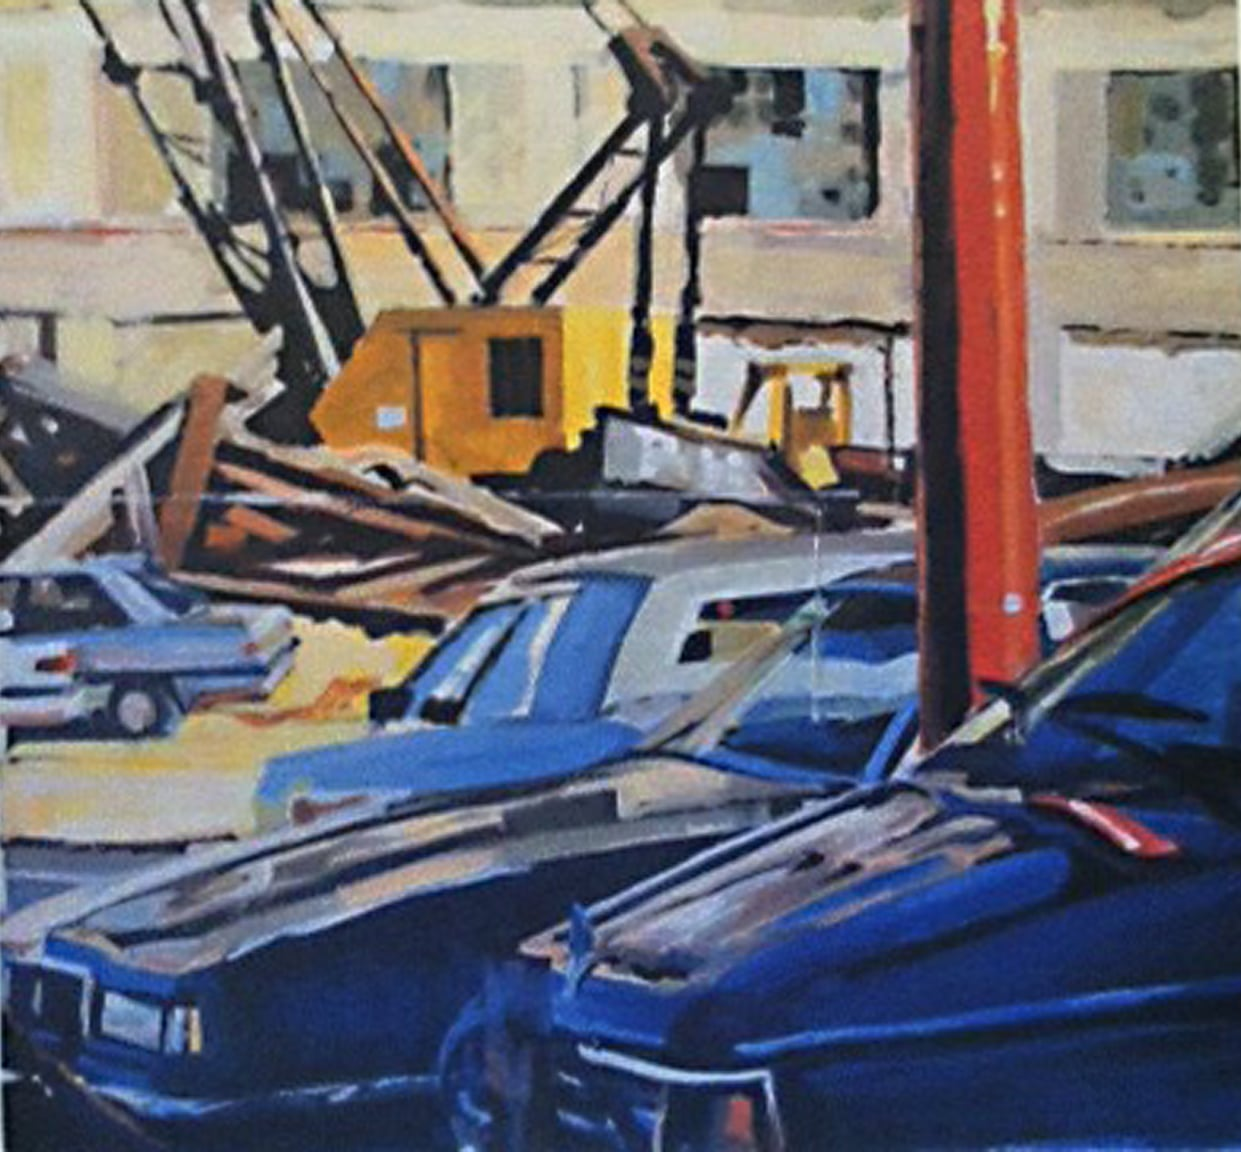 "Cars, Yellow Crane & Demolition, acrylic on paper, 28"" x 36"", 1990"